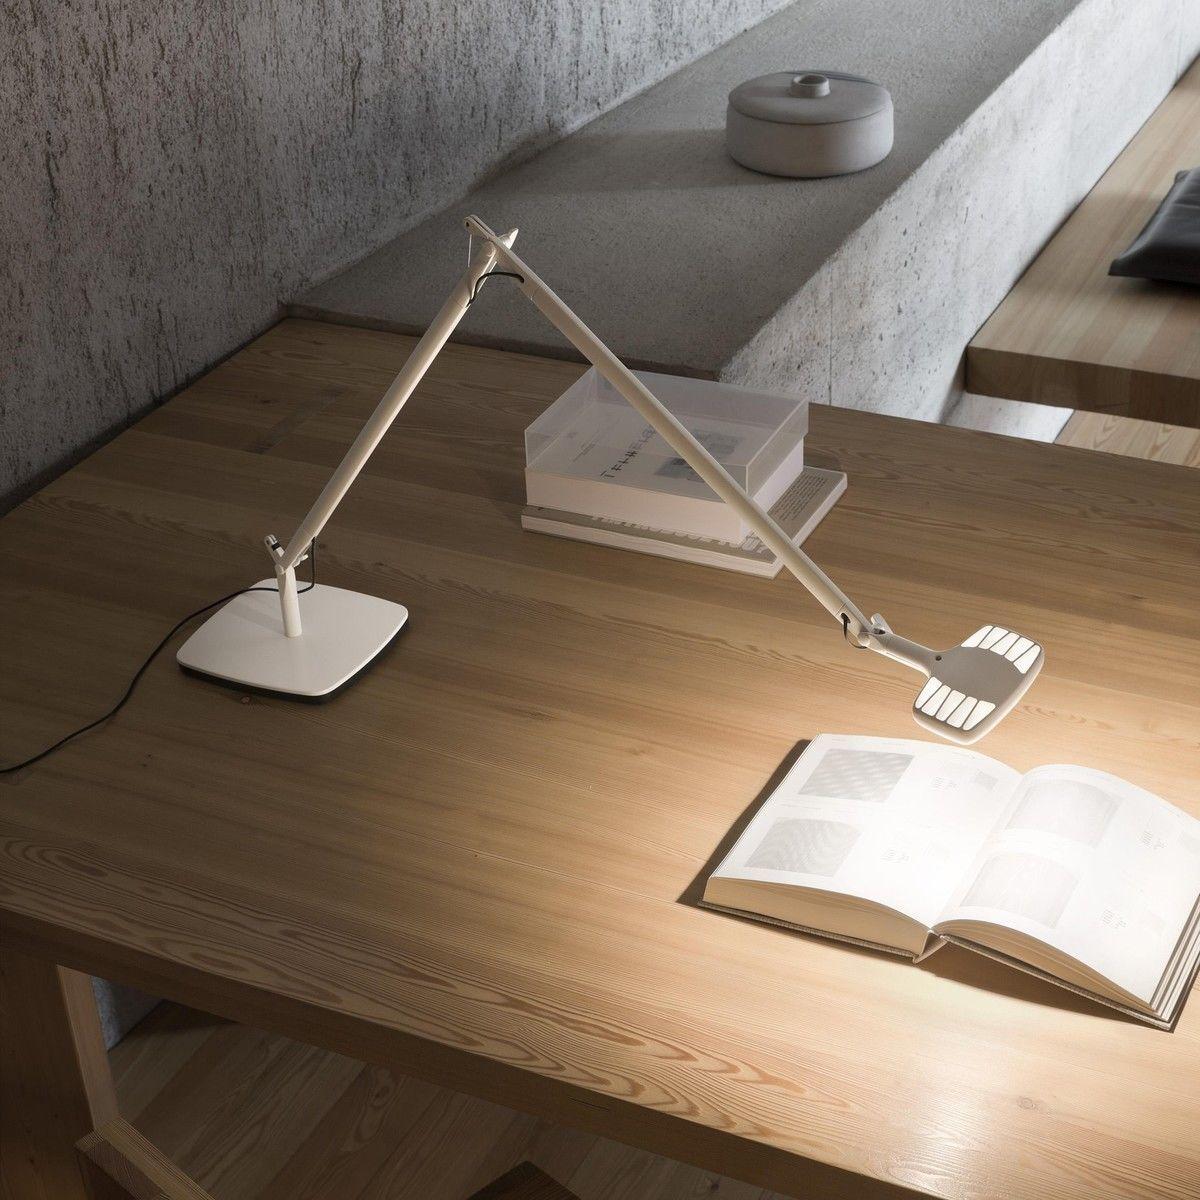 otto watt led lampe de bureau dimmable luceplan. Black Bedroom Furniture Sets. Home Design Ideas